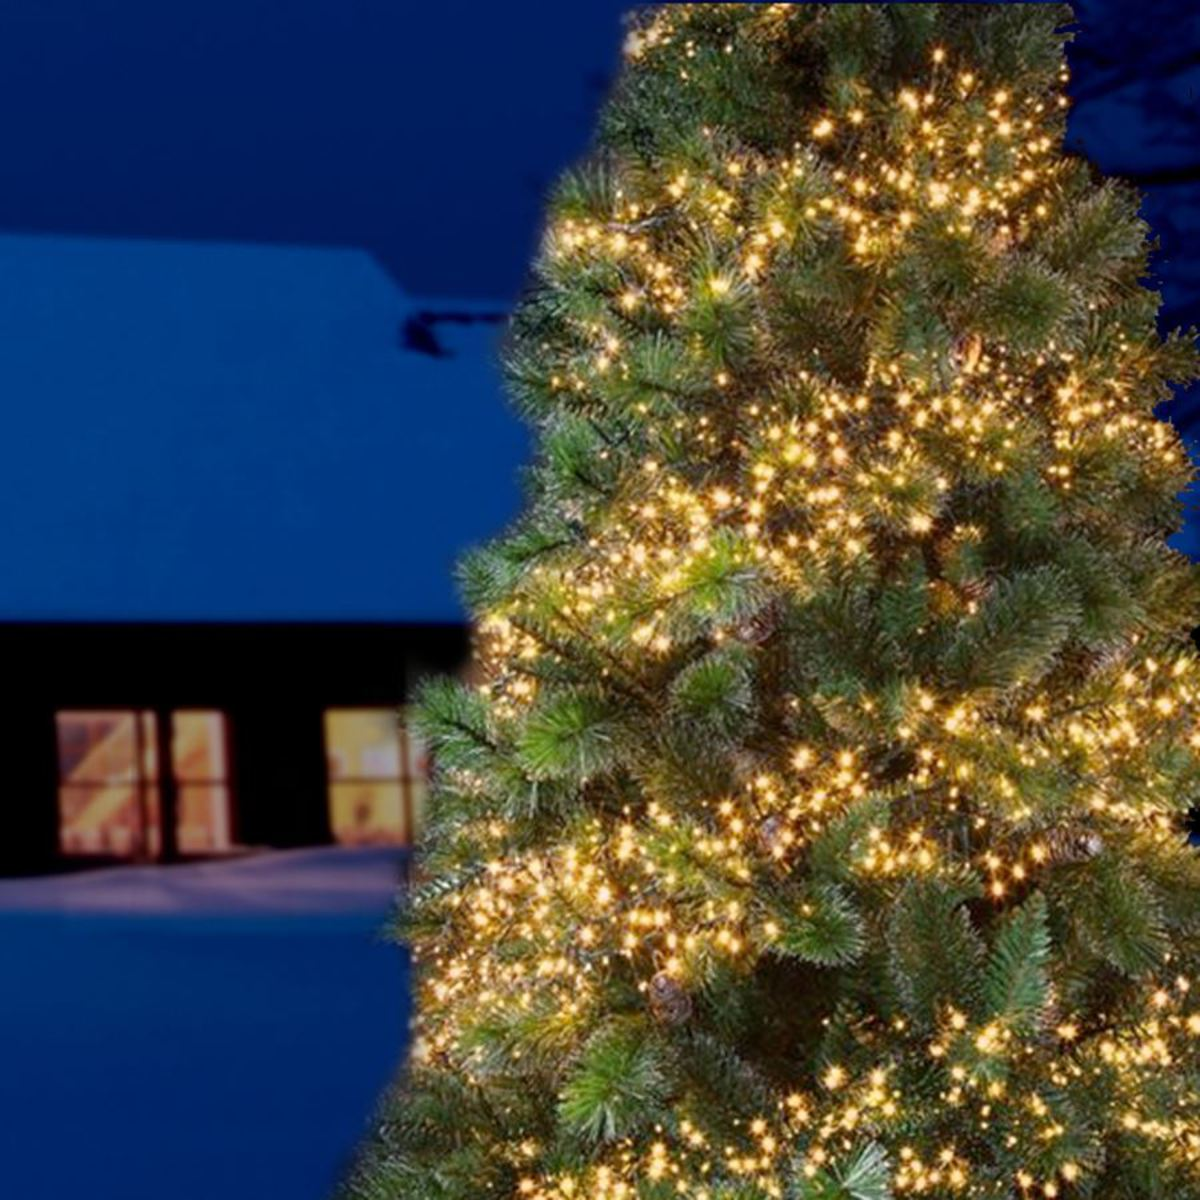 Bild 2 von LED-Cluster-Lichterkette 1152 LEDs